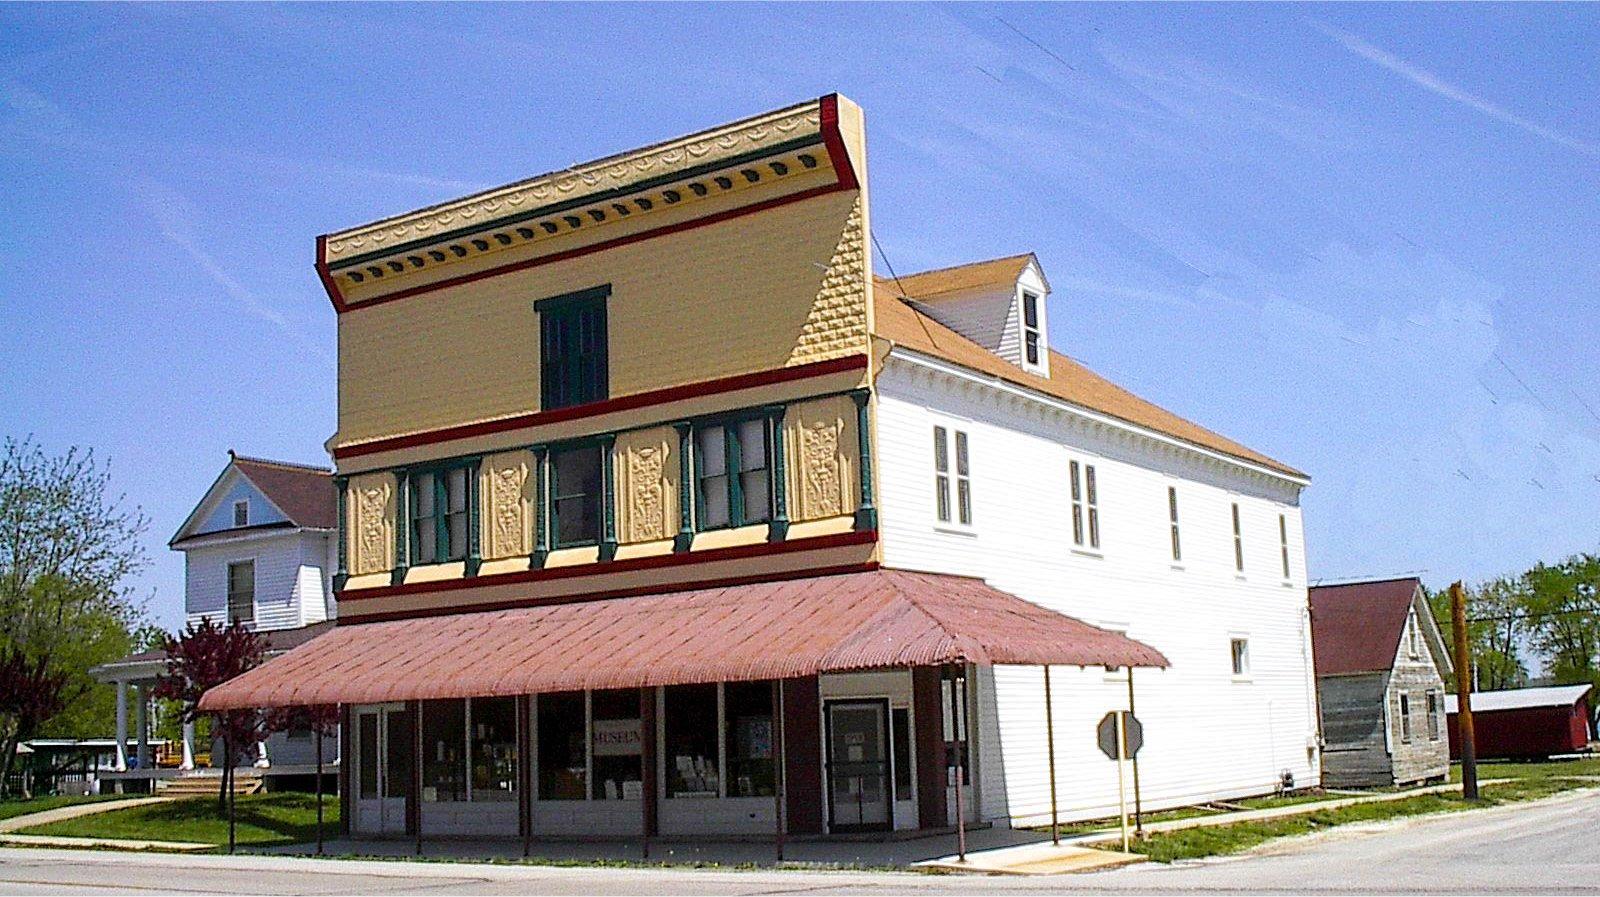 The historic Kamp Store